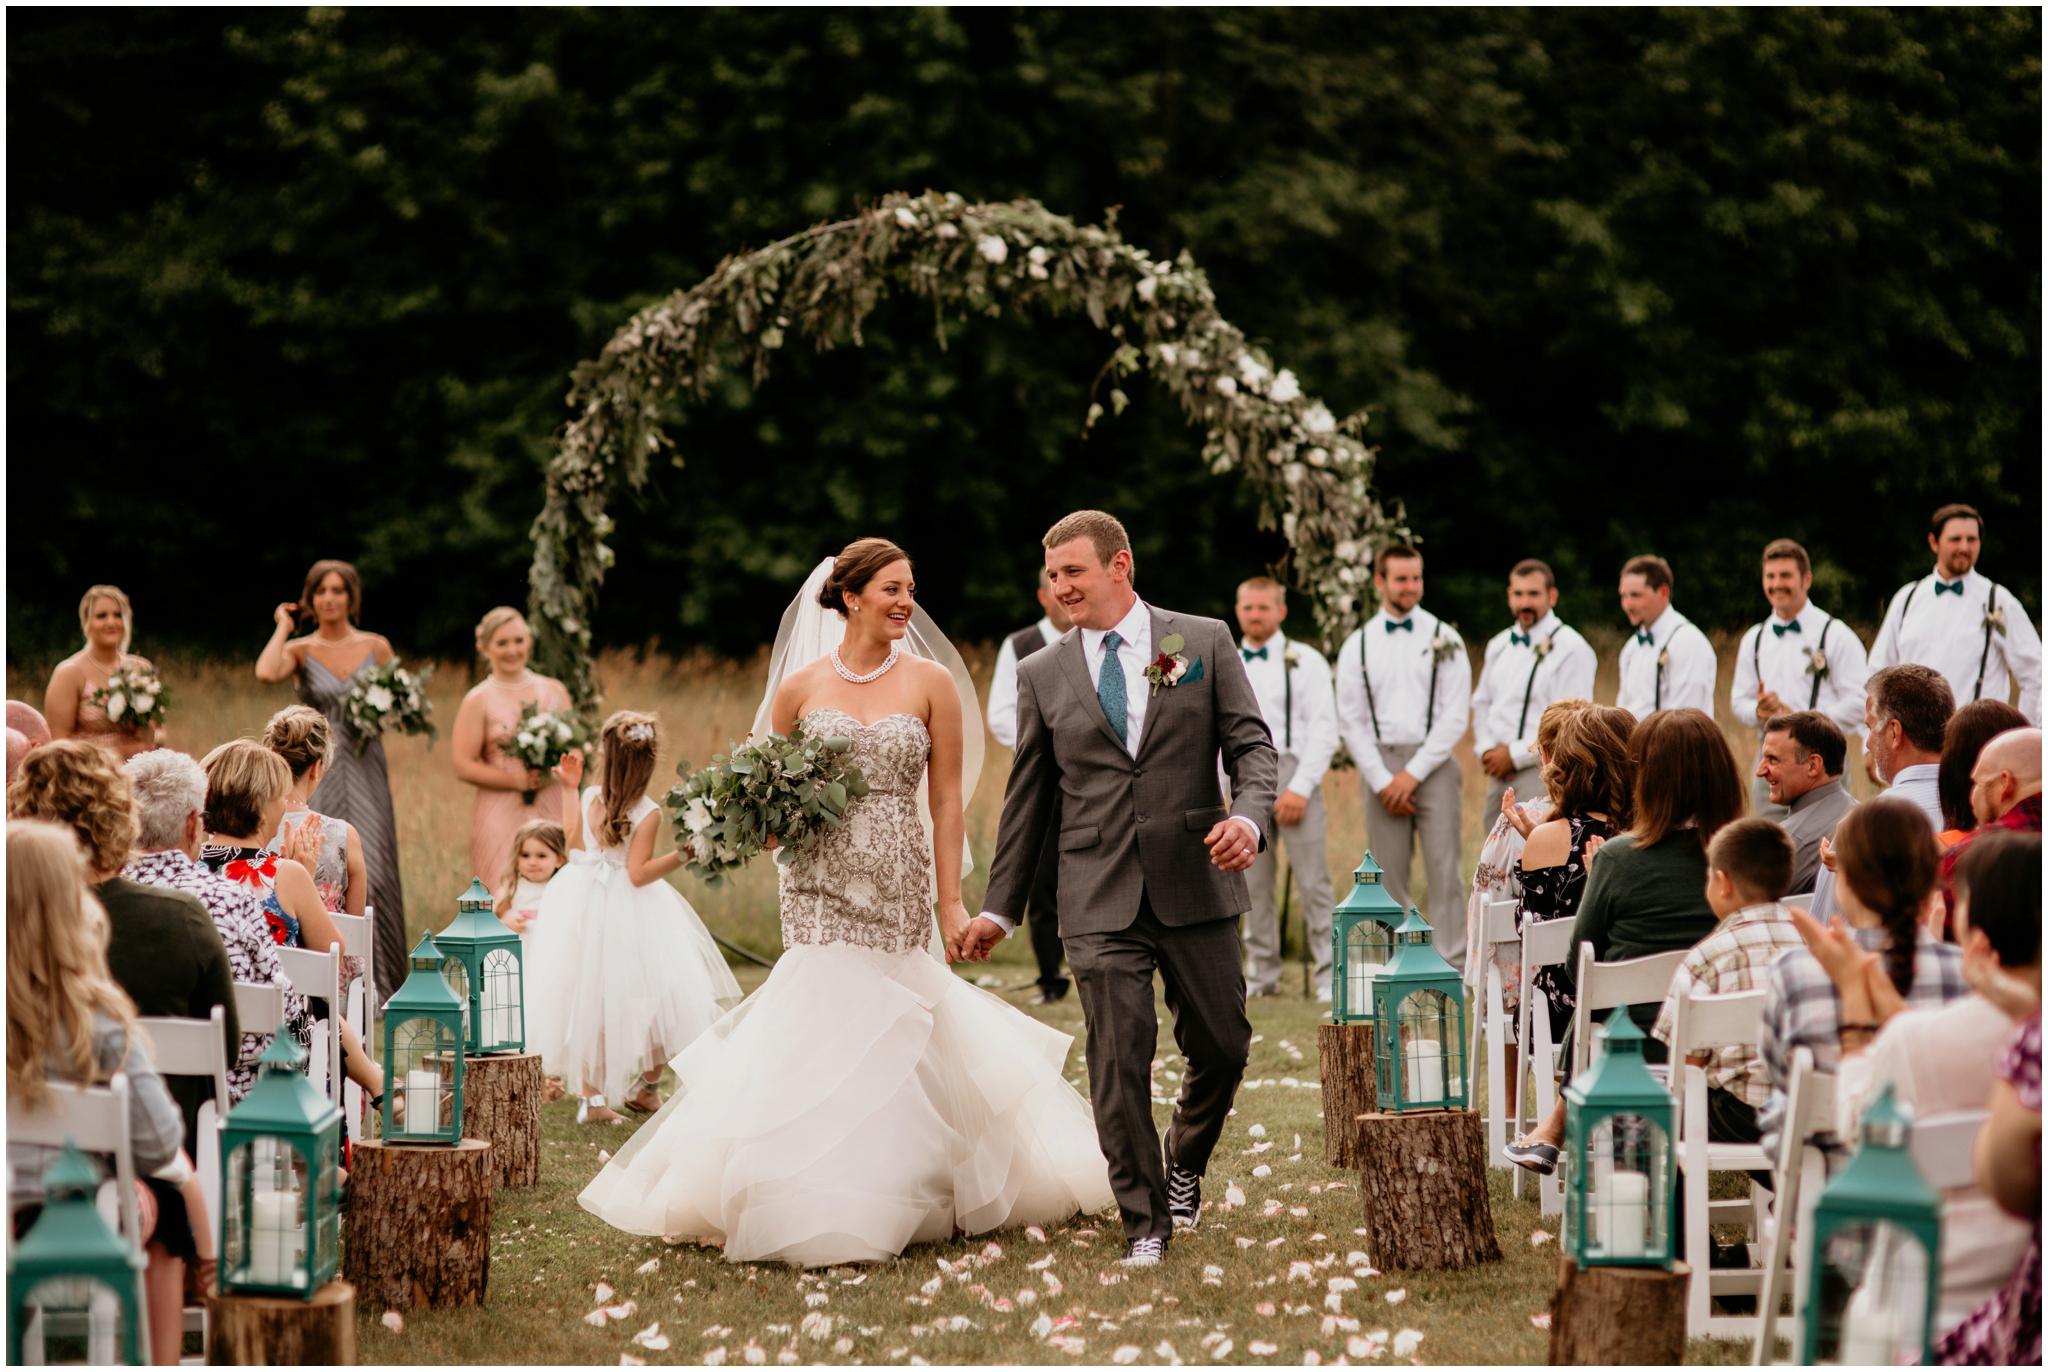 alex-and-matthew-three-cs-farm-venue-seattle-wedding-photographer-112.jpg